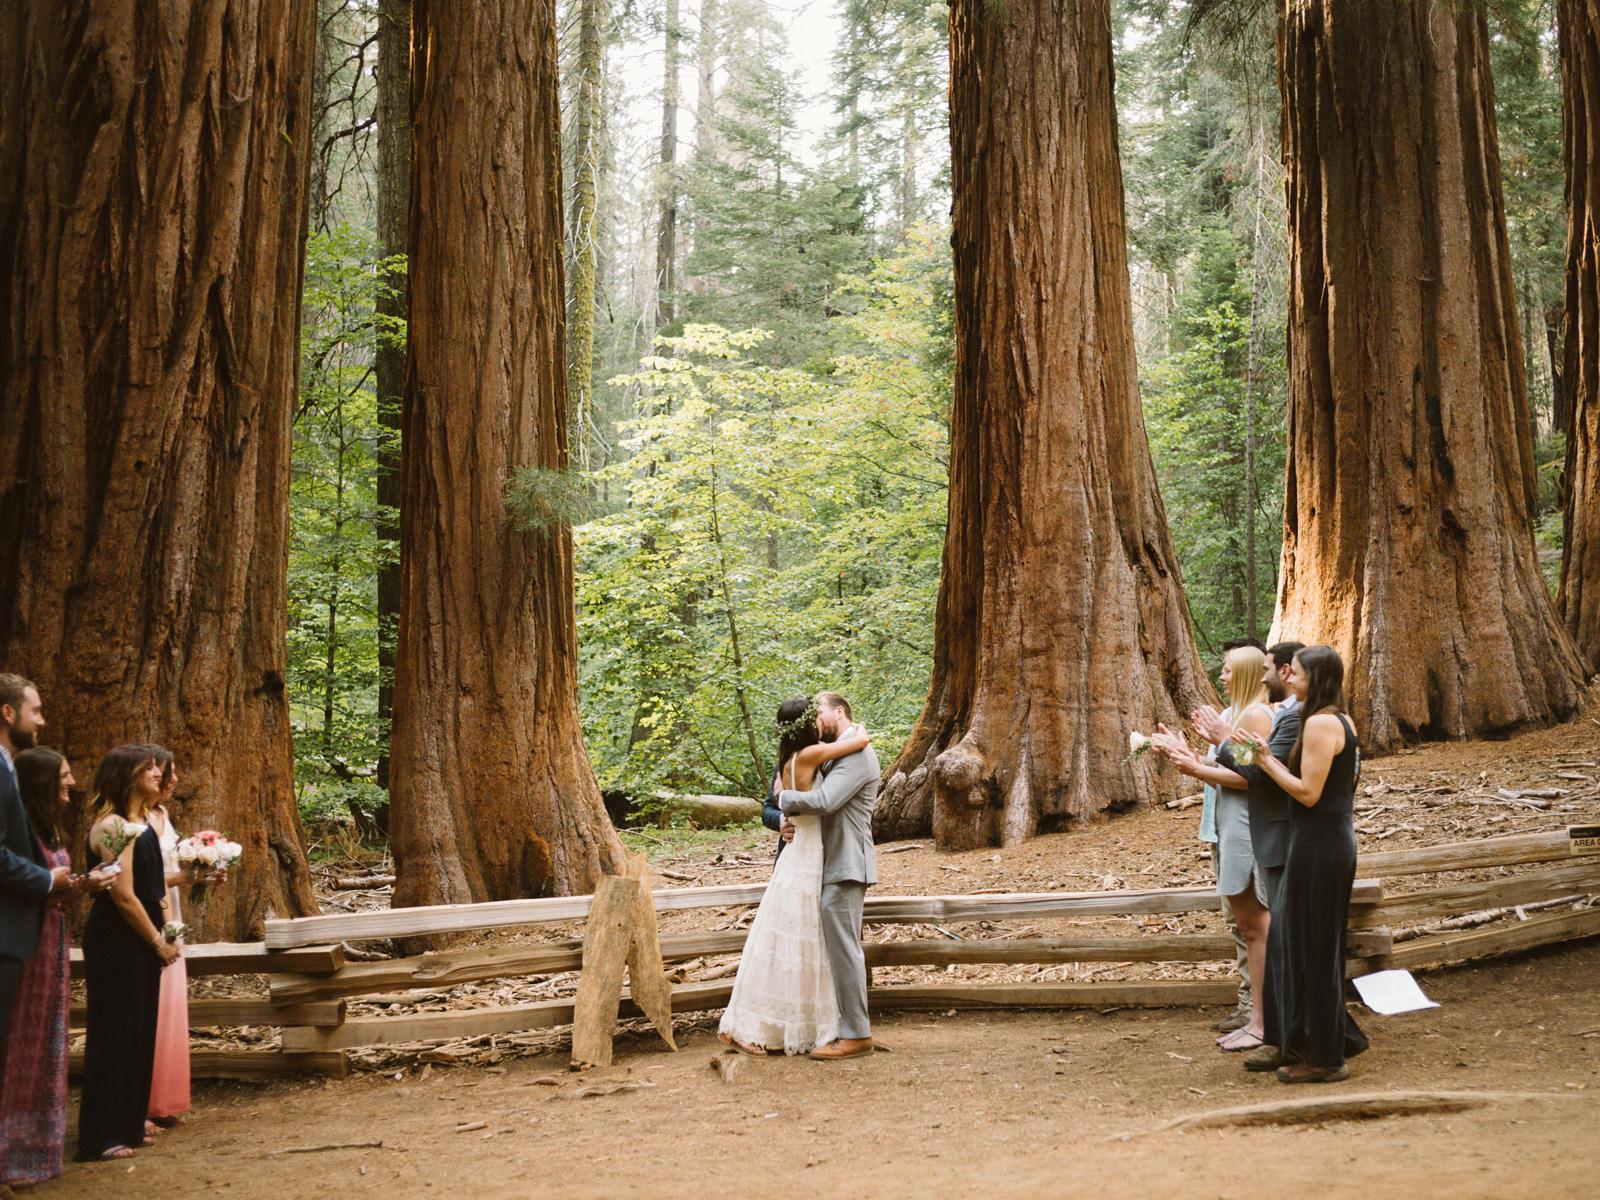 yosemite-intimate-wedding-061 YOSEMITE INTIMATE WEDDING